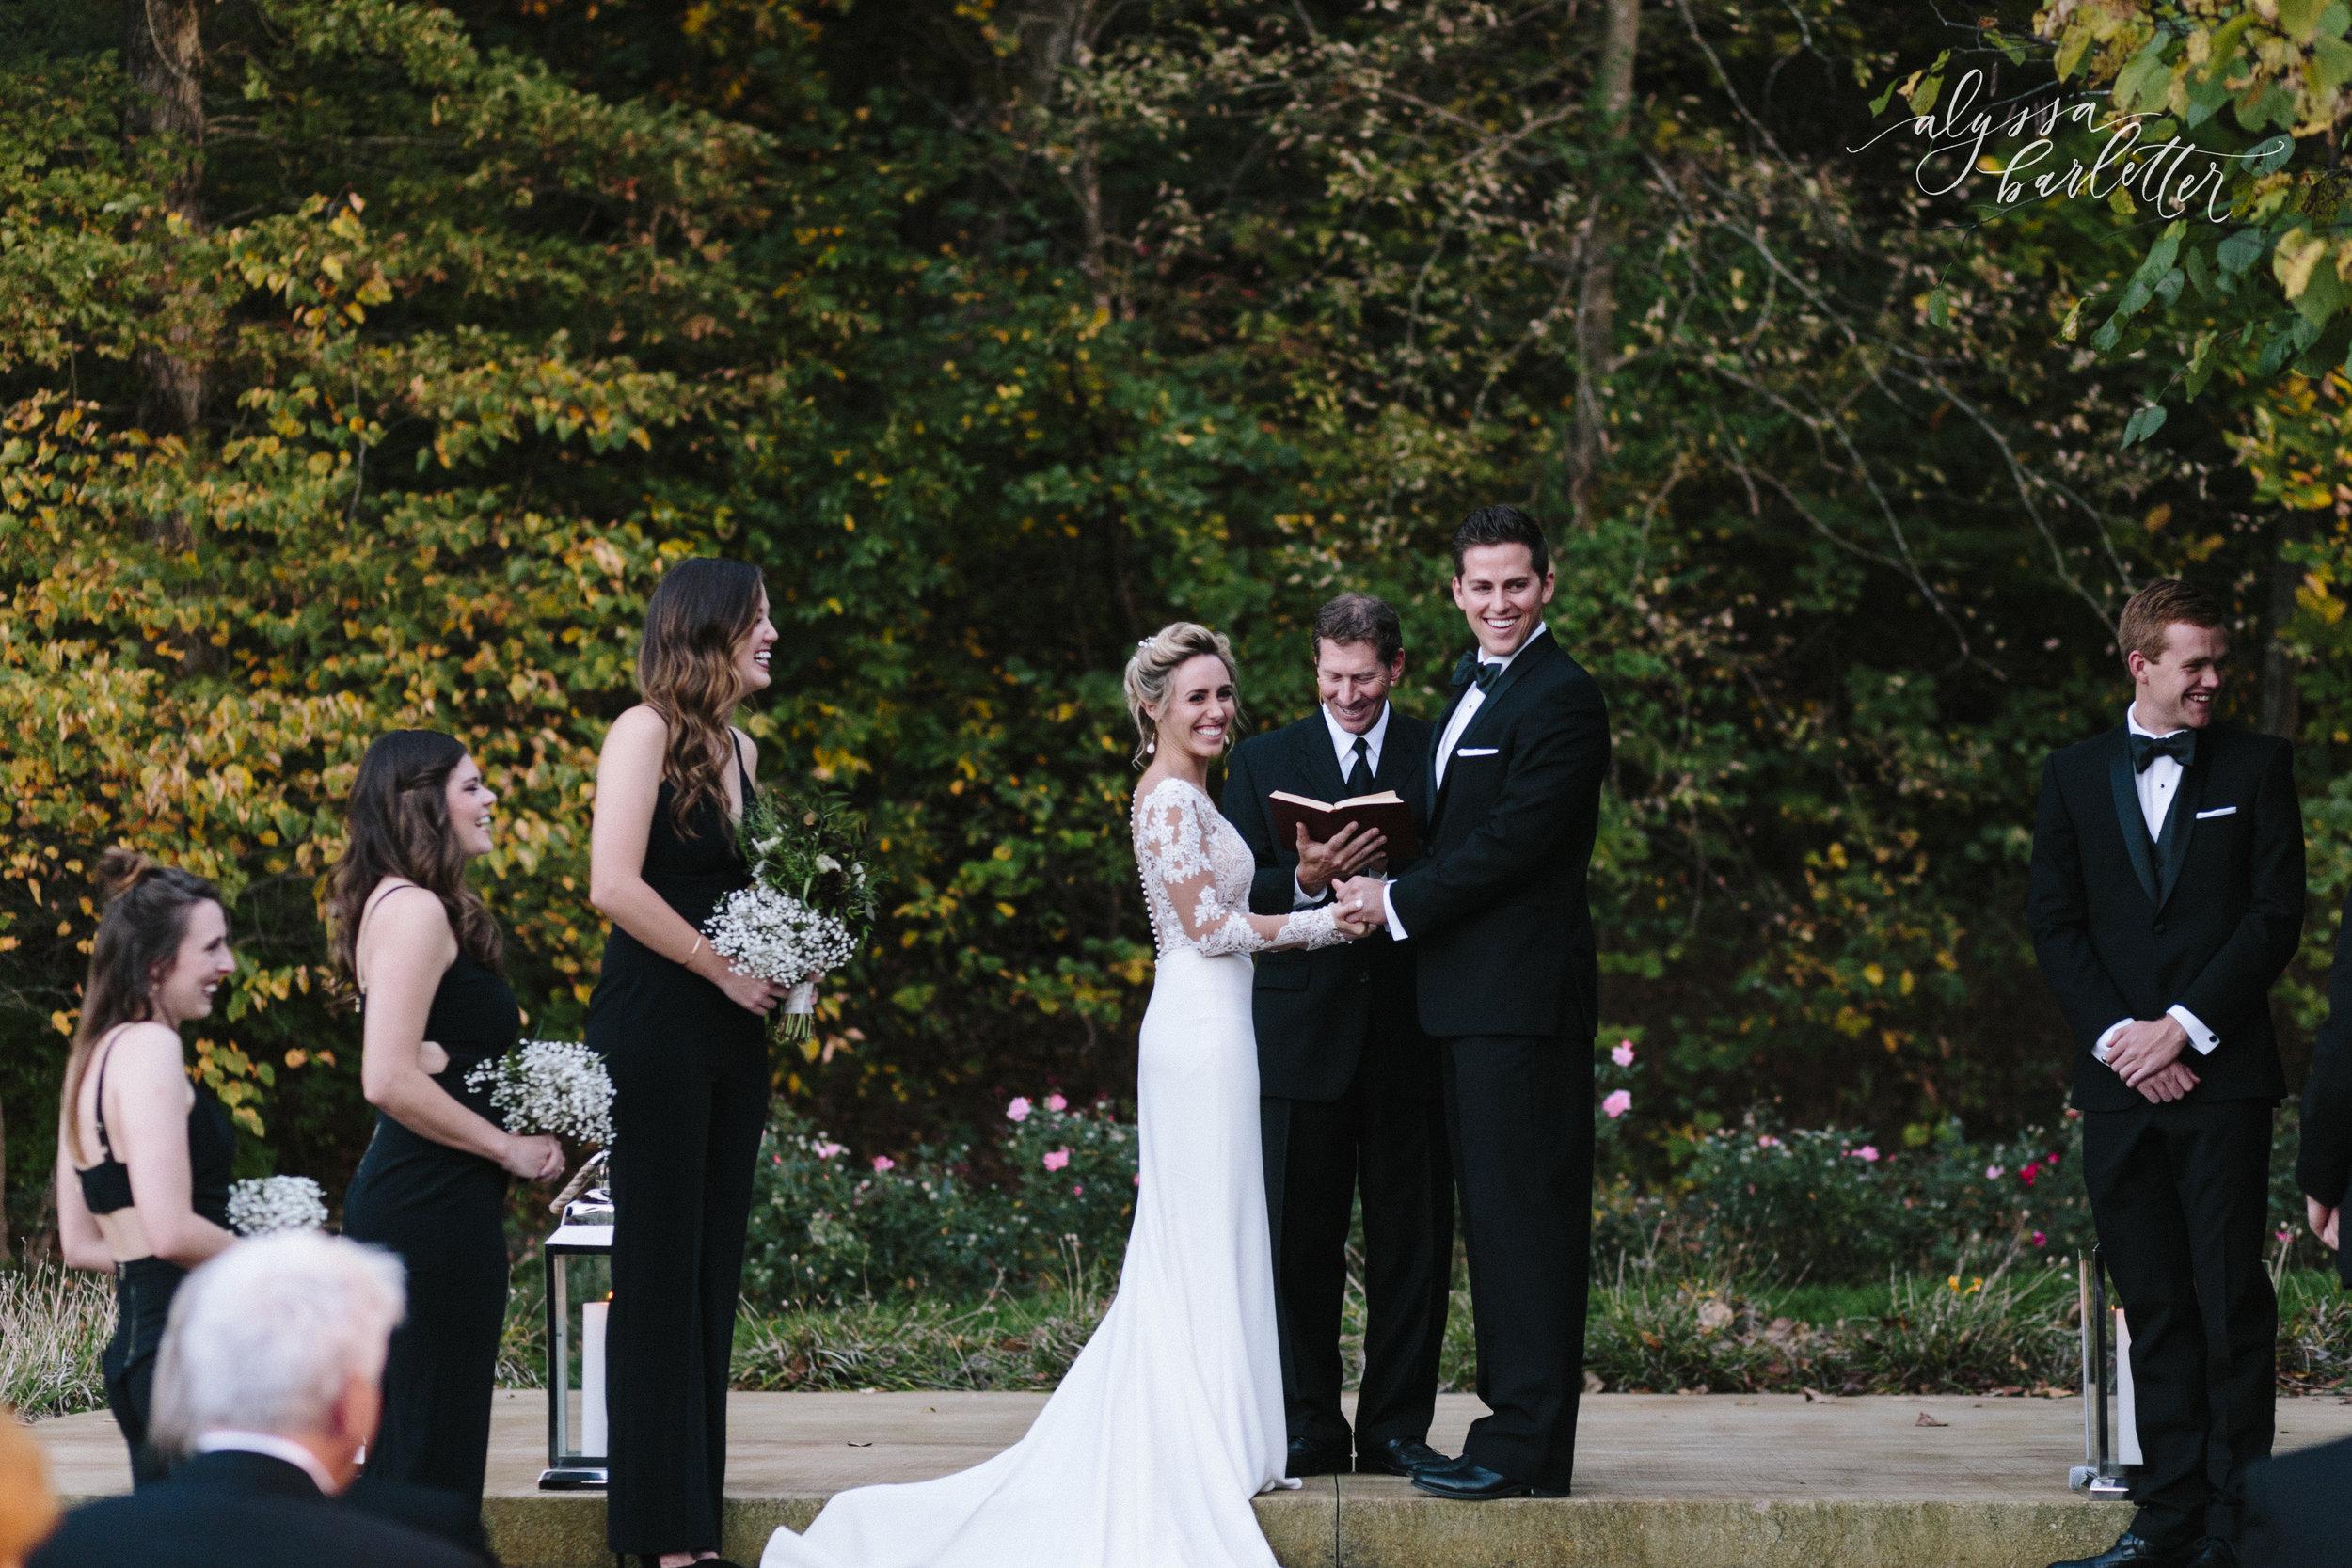 alyssa barletter photography fayetteville arkansas wedding photos micah and colin-1-45.jpg